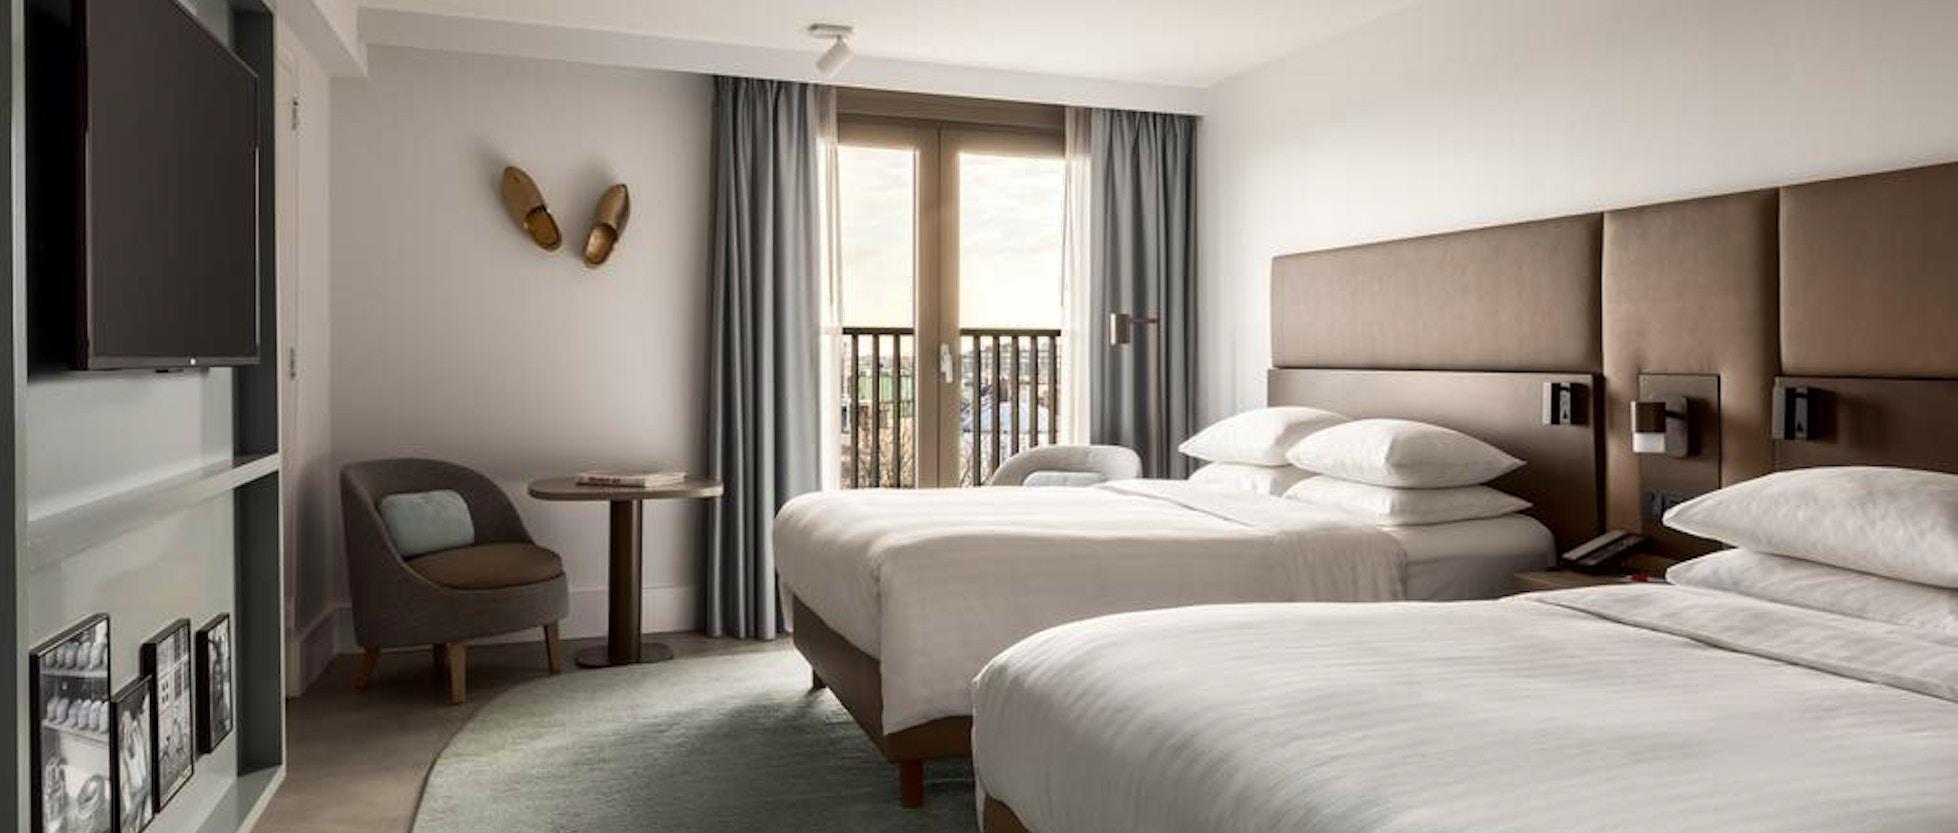 10 Hotel di Amsterdam a Leidseplein | VIVI Amsterdam